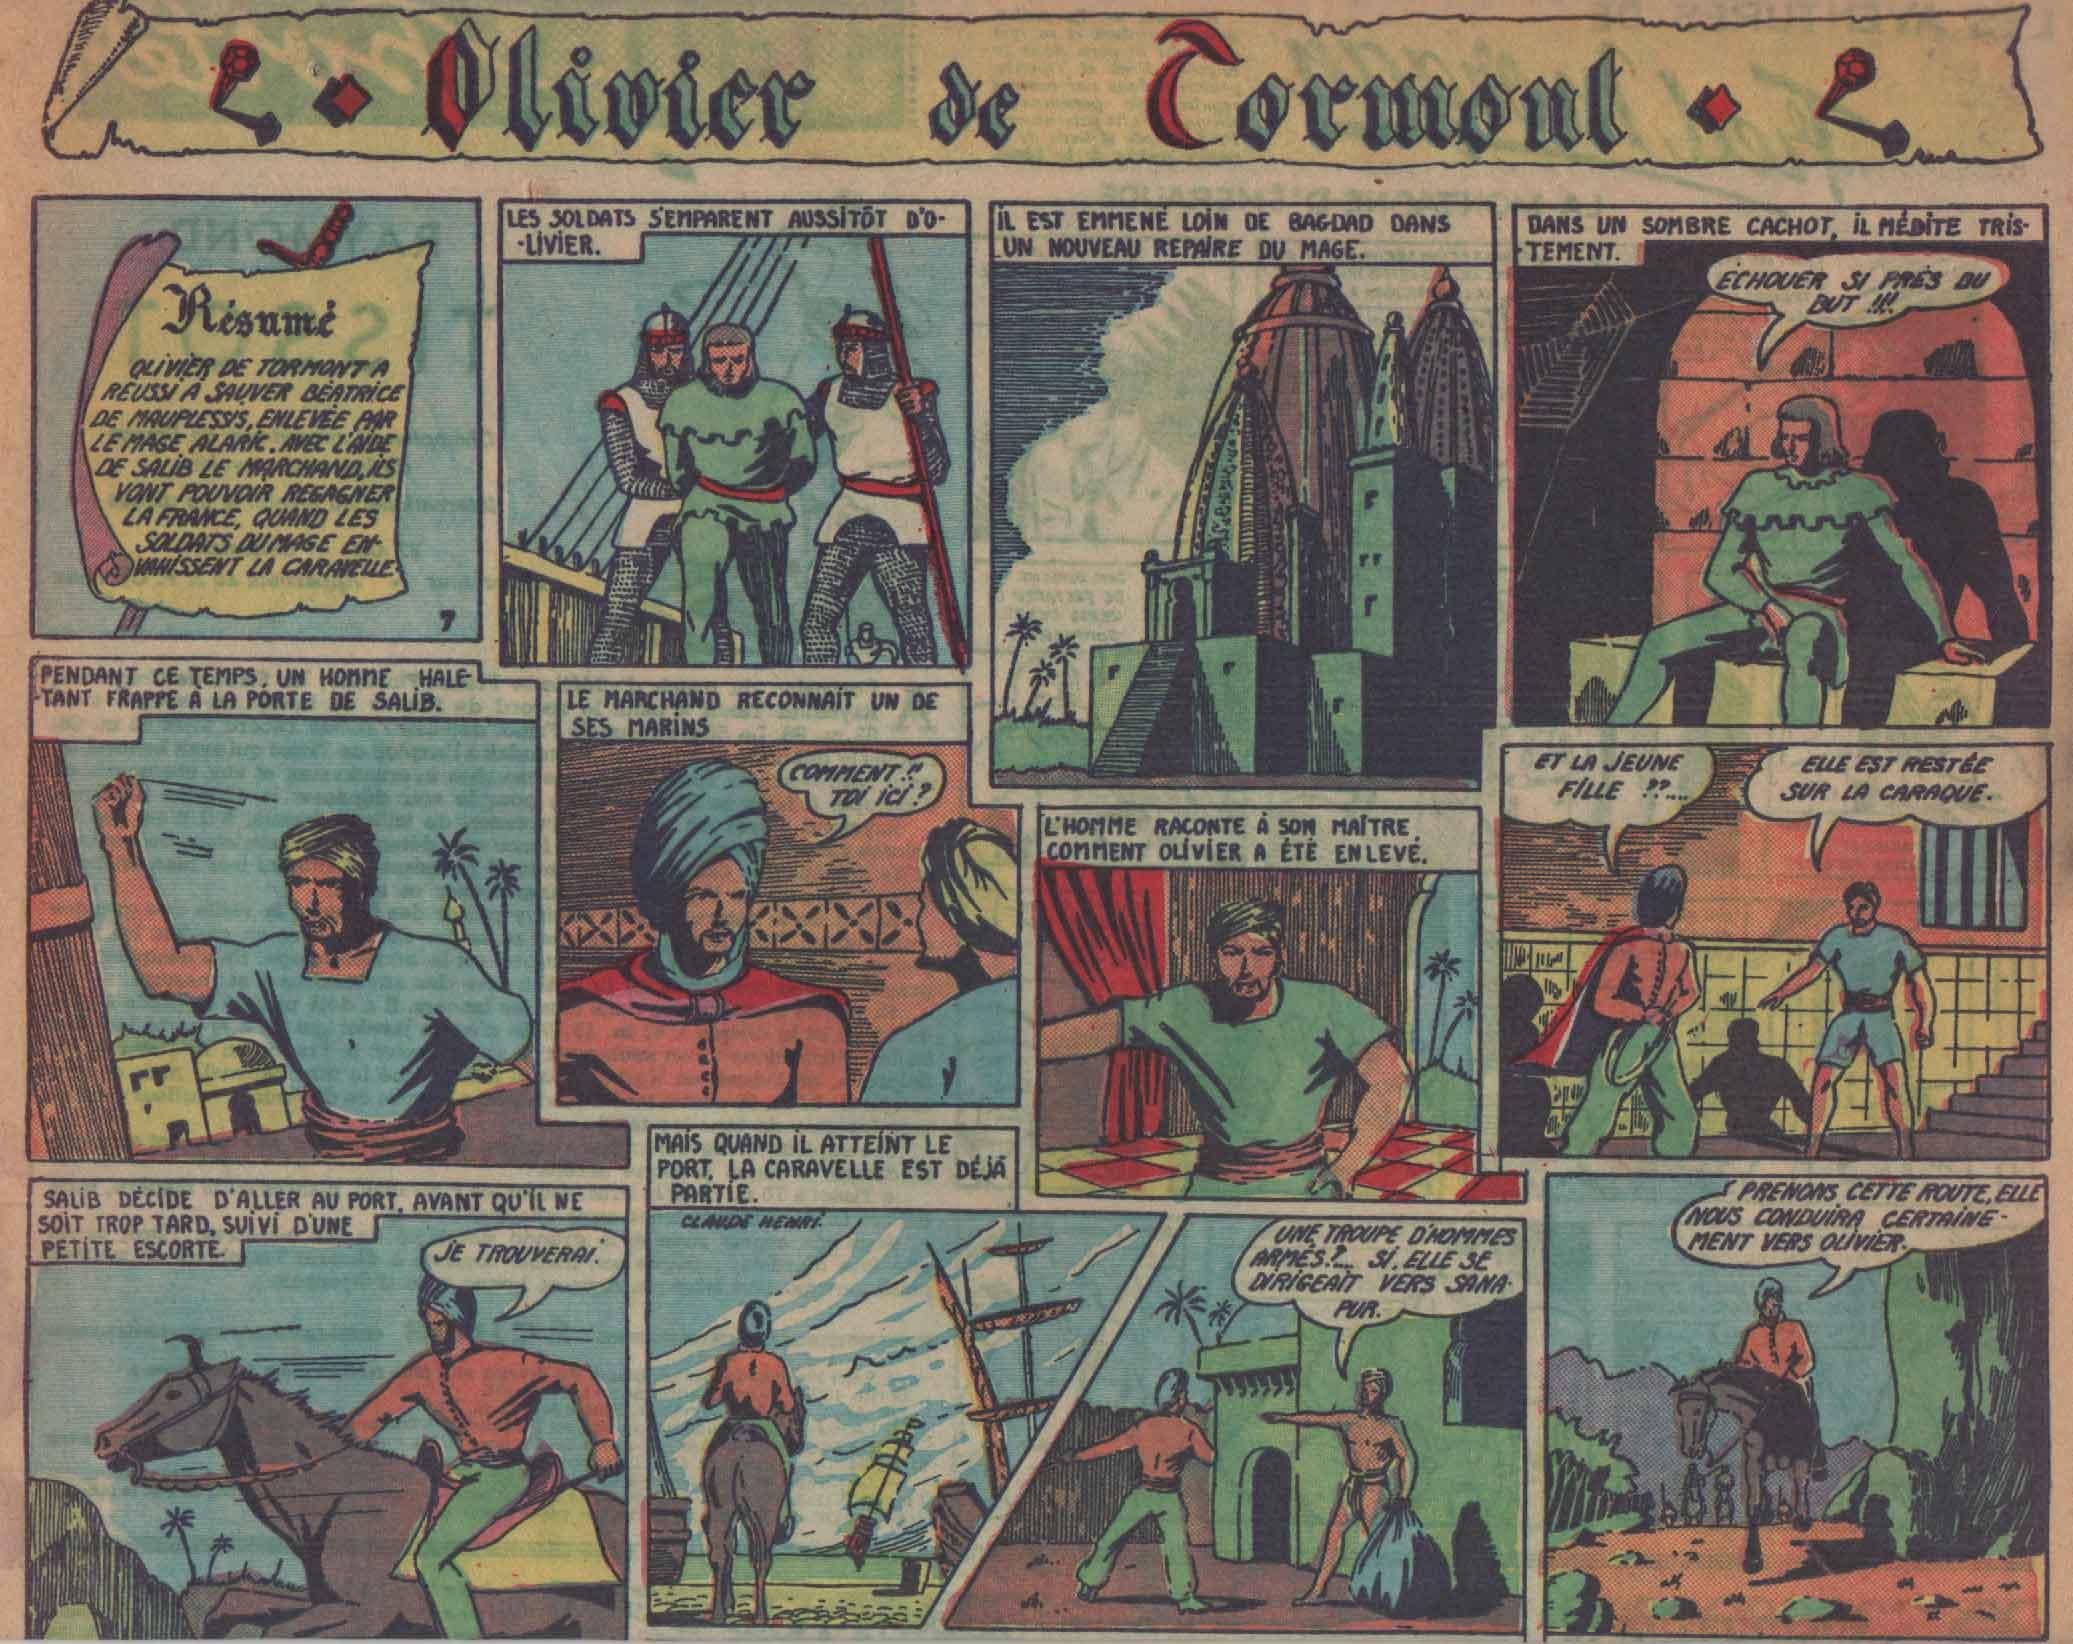 « Olivier de Tormont » Jeudi magazine n° 23 (07/11/1946).